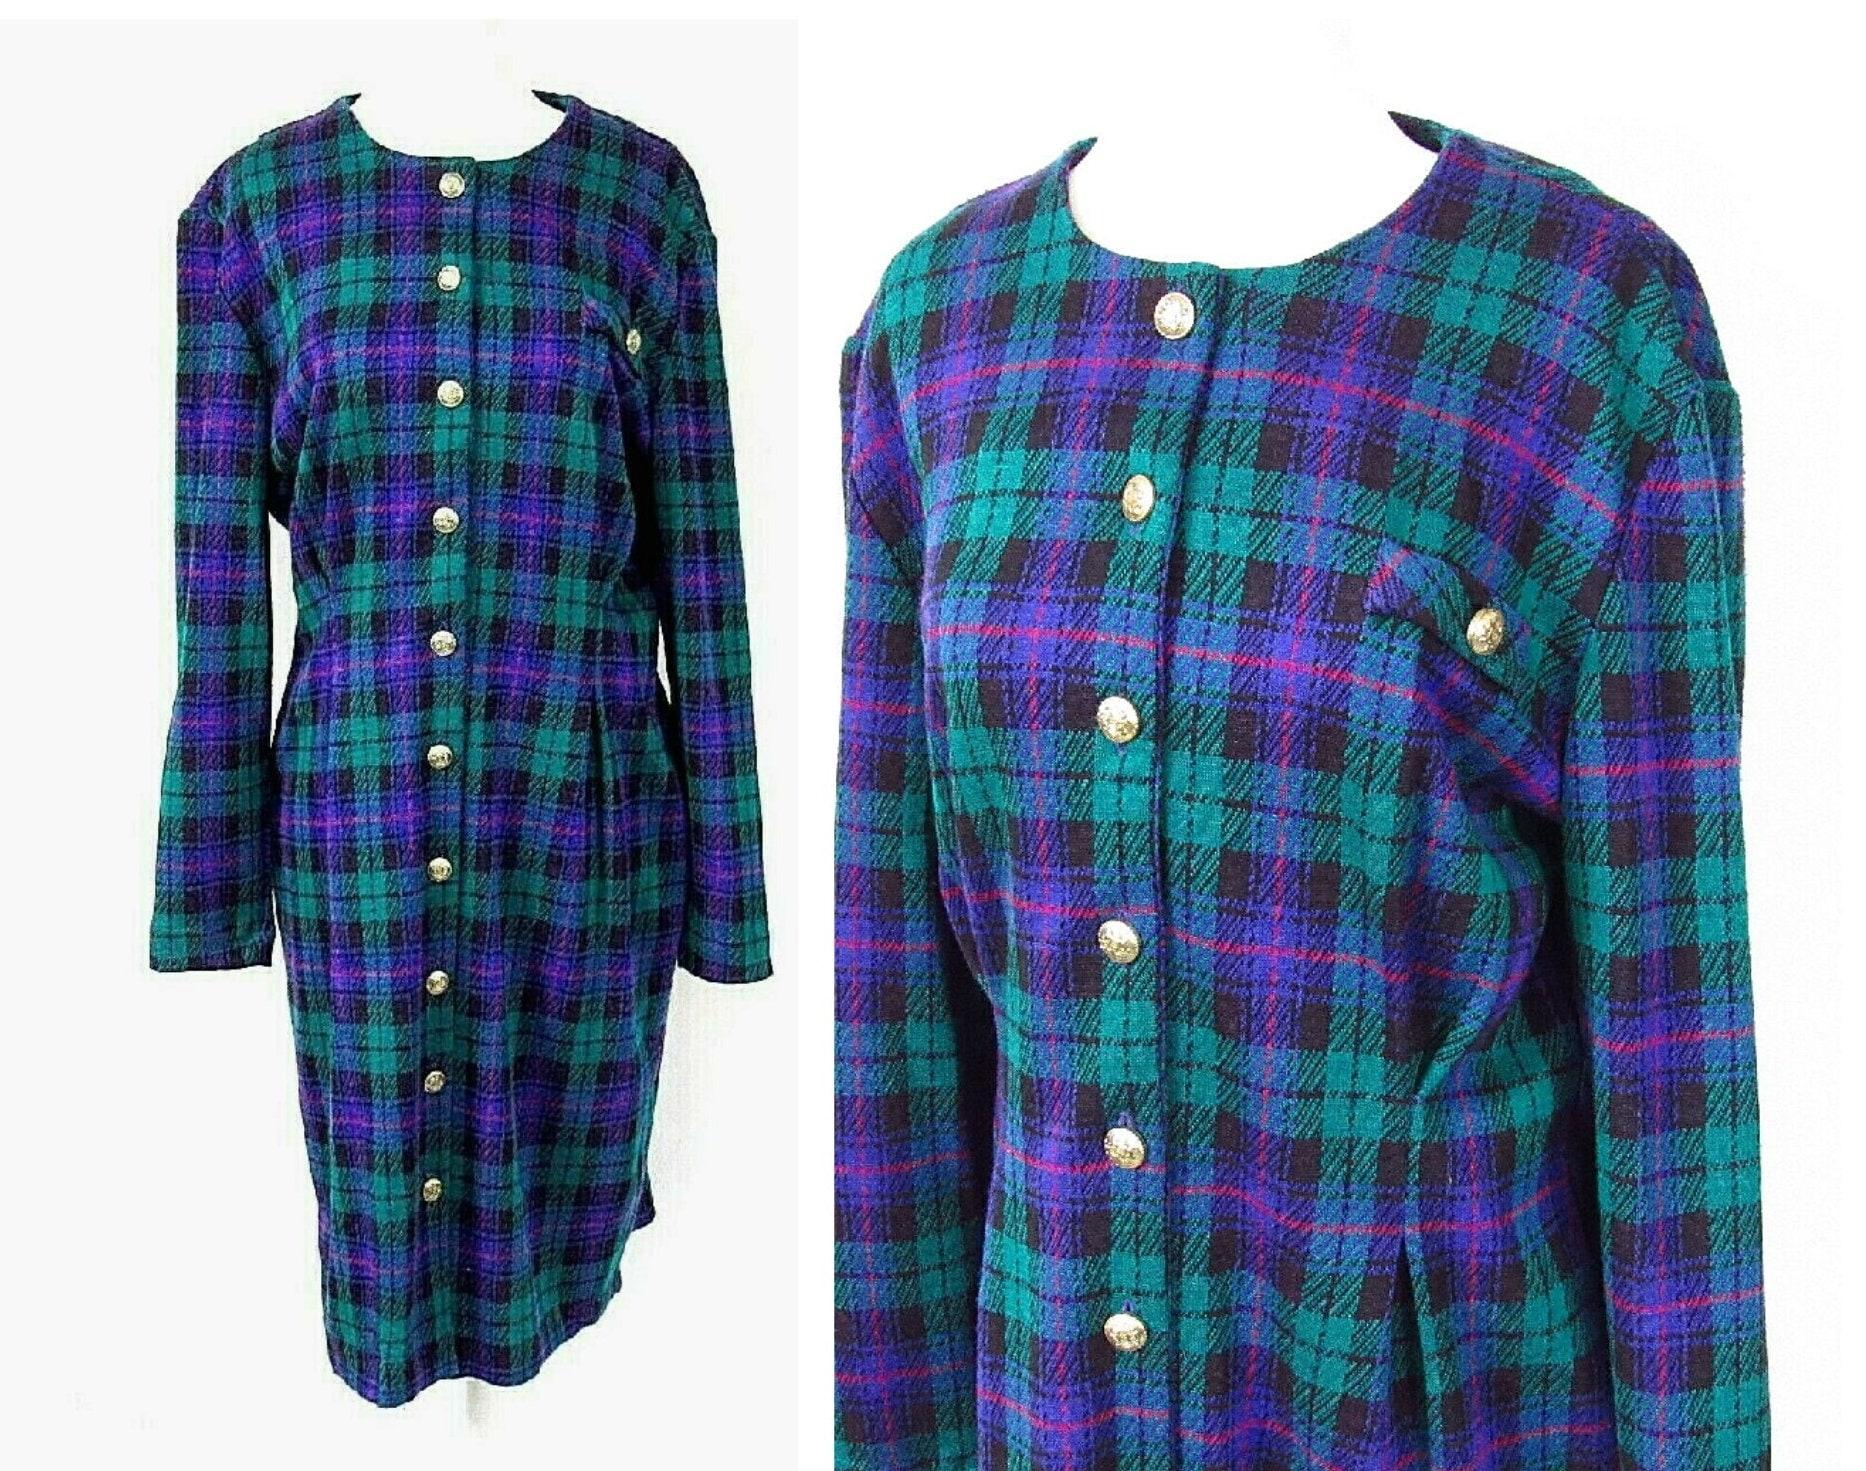 80s Dresses | Casual to Party Dresses Plaid 1980S Vintage Knit Dress Approximate Size Large $0.00 AT vintagedancer.com